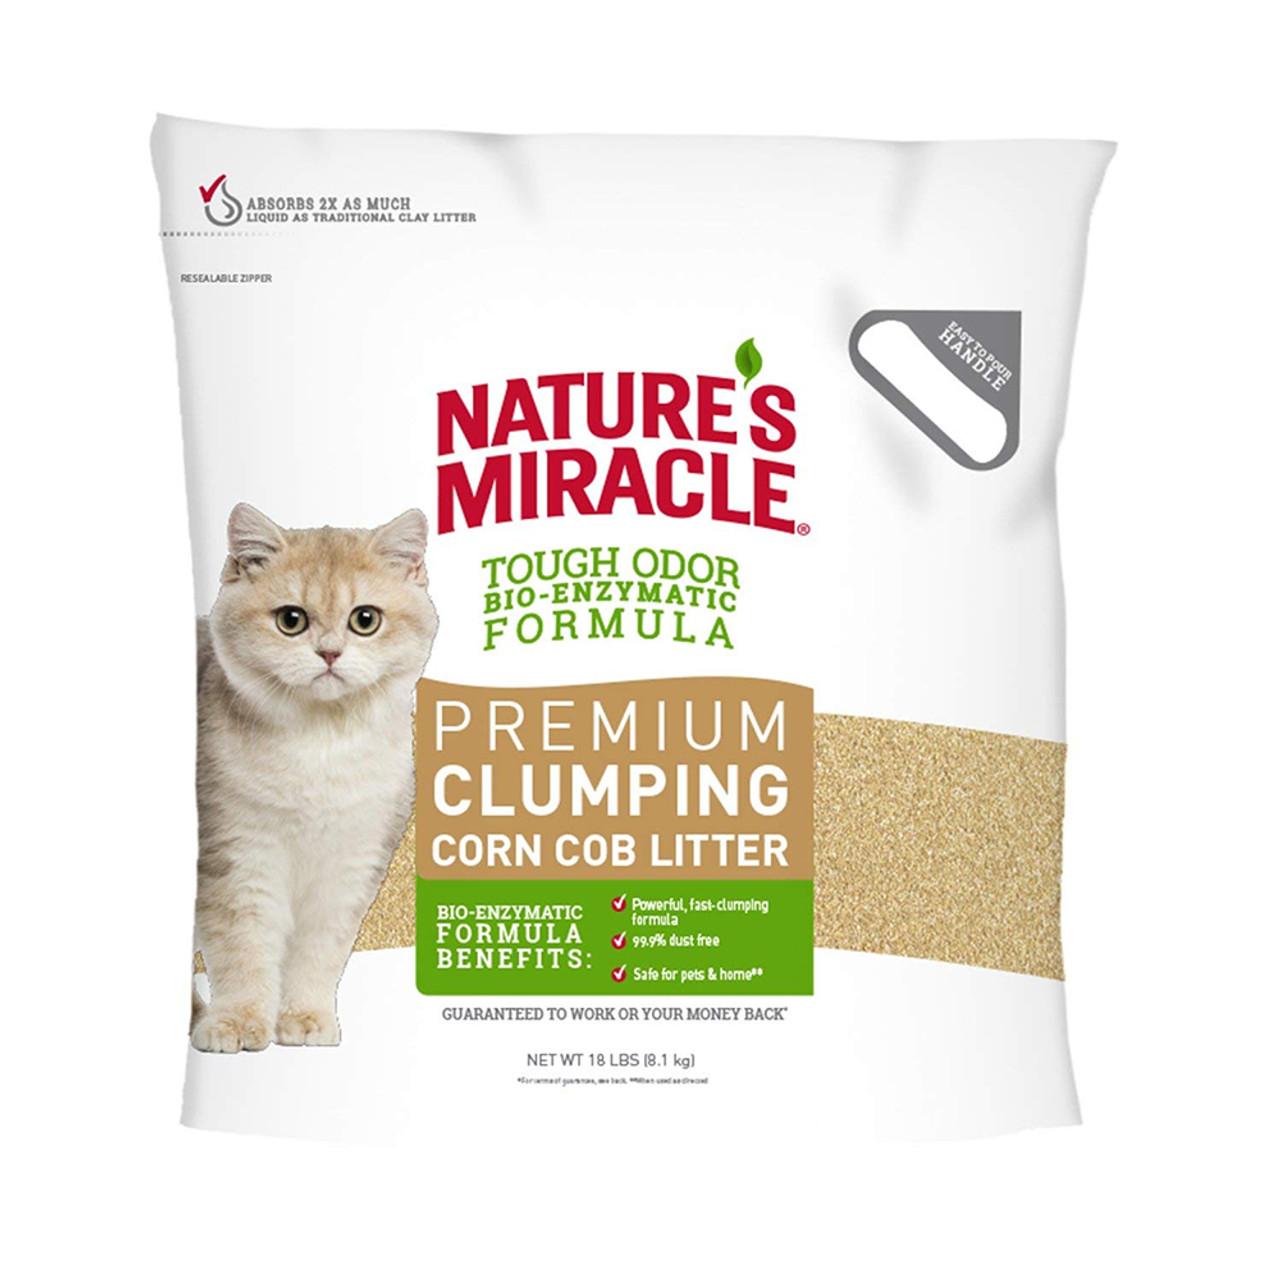 Nature's Miracle Premium Clumping Corn Cob Cat Litter - 18 lb